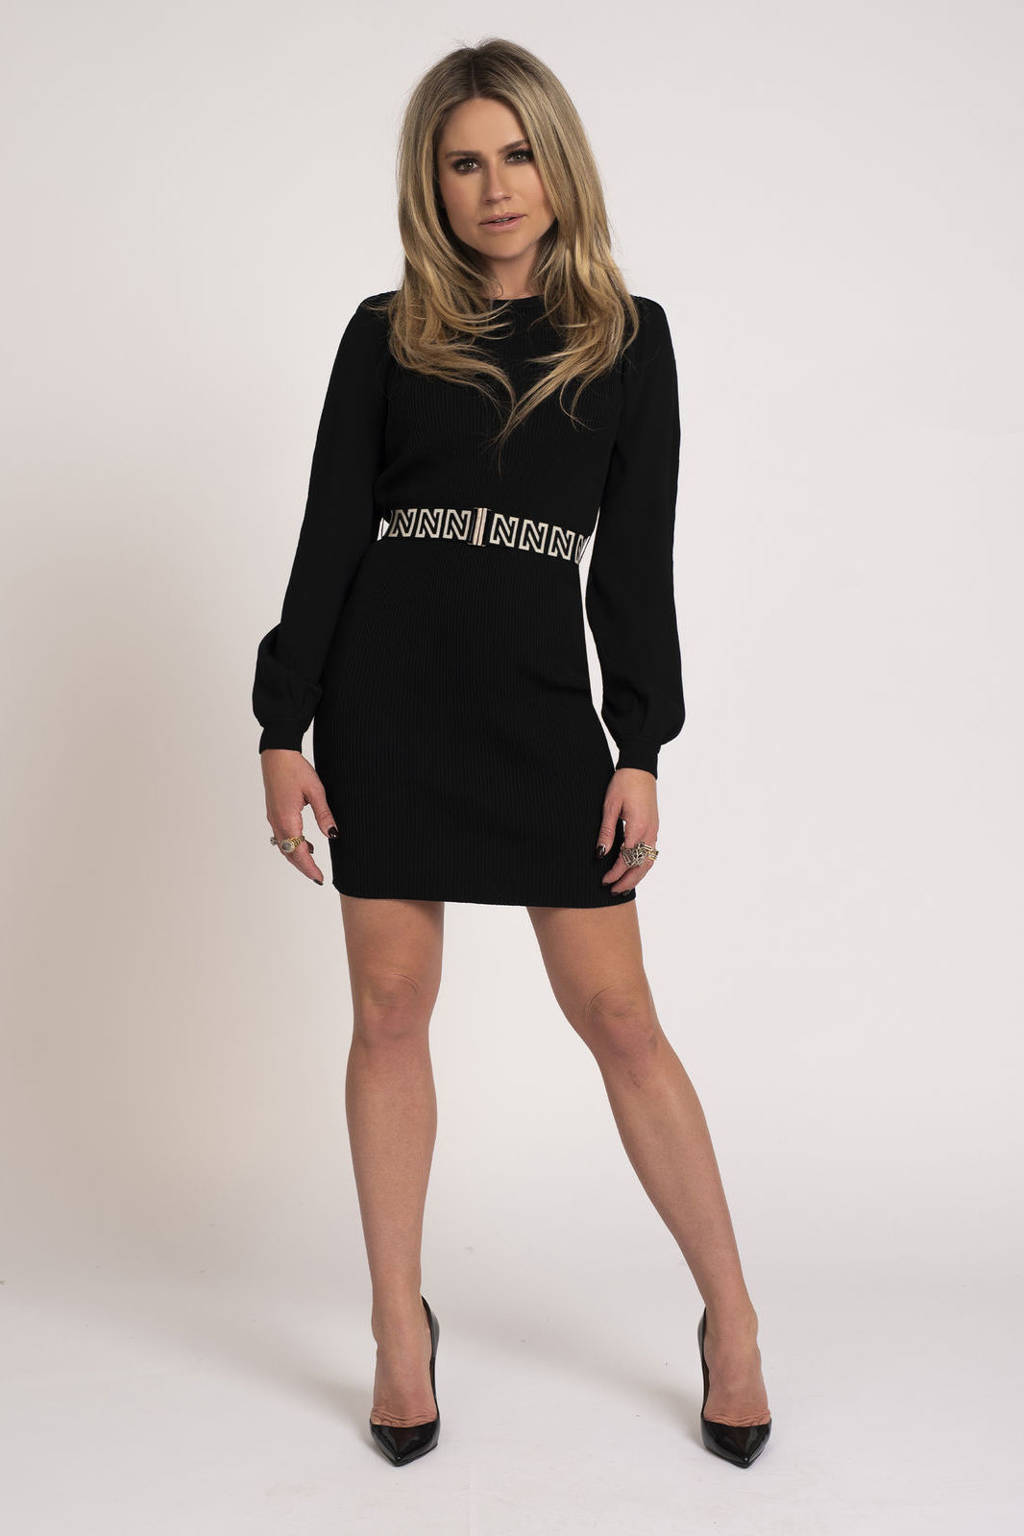 NIKKIE ribgebreide jurk Plum met ceintuur zwart, Zwart